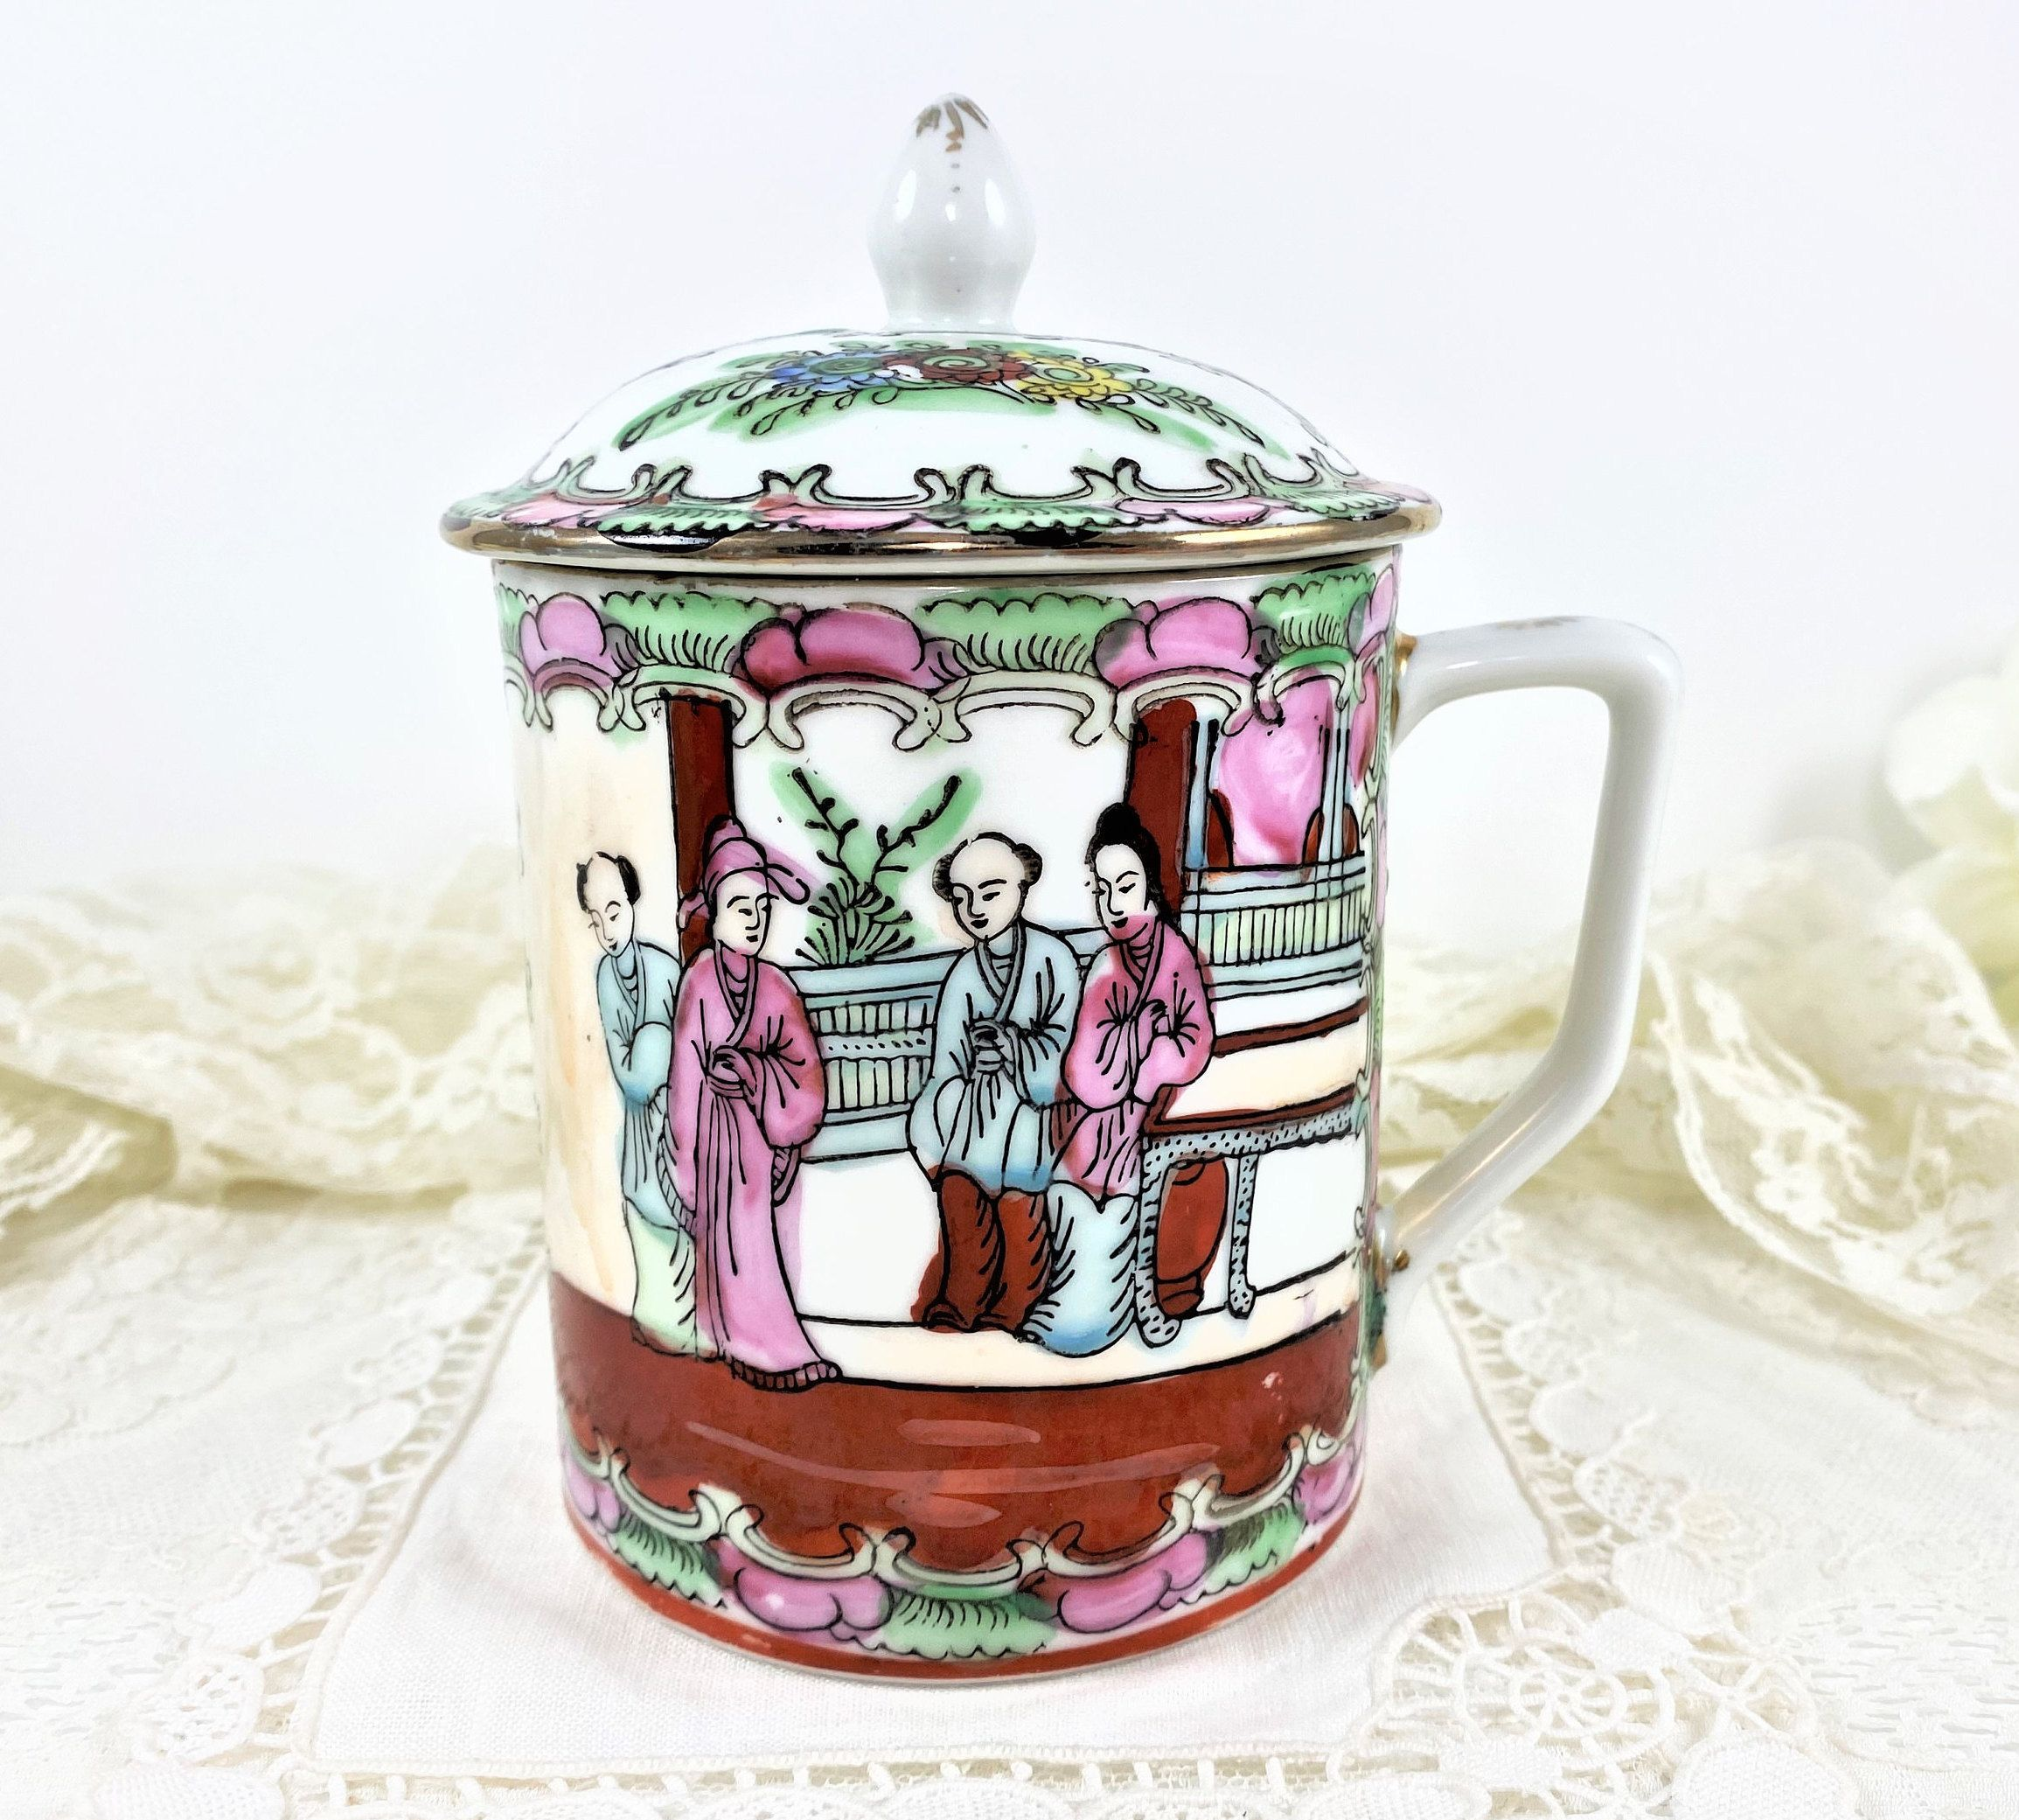 SUGAR BOWL New Century Fine Porcelain Sugar Bowl Victorian Courting Scene Gold Embellished Sugar Bowl